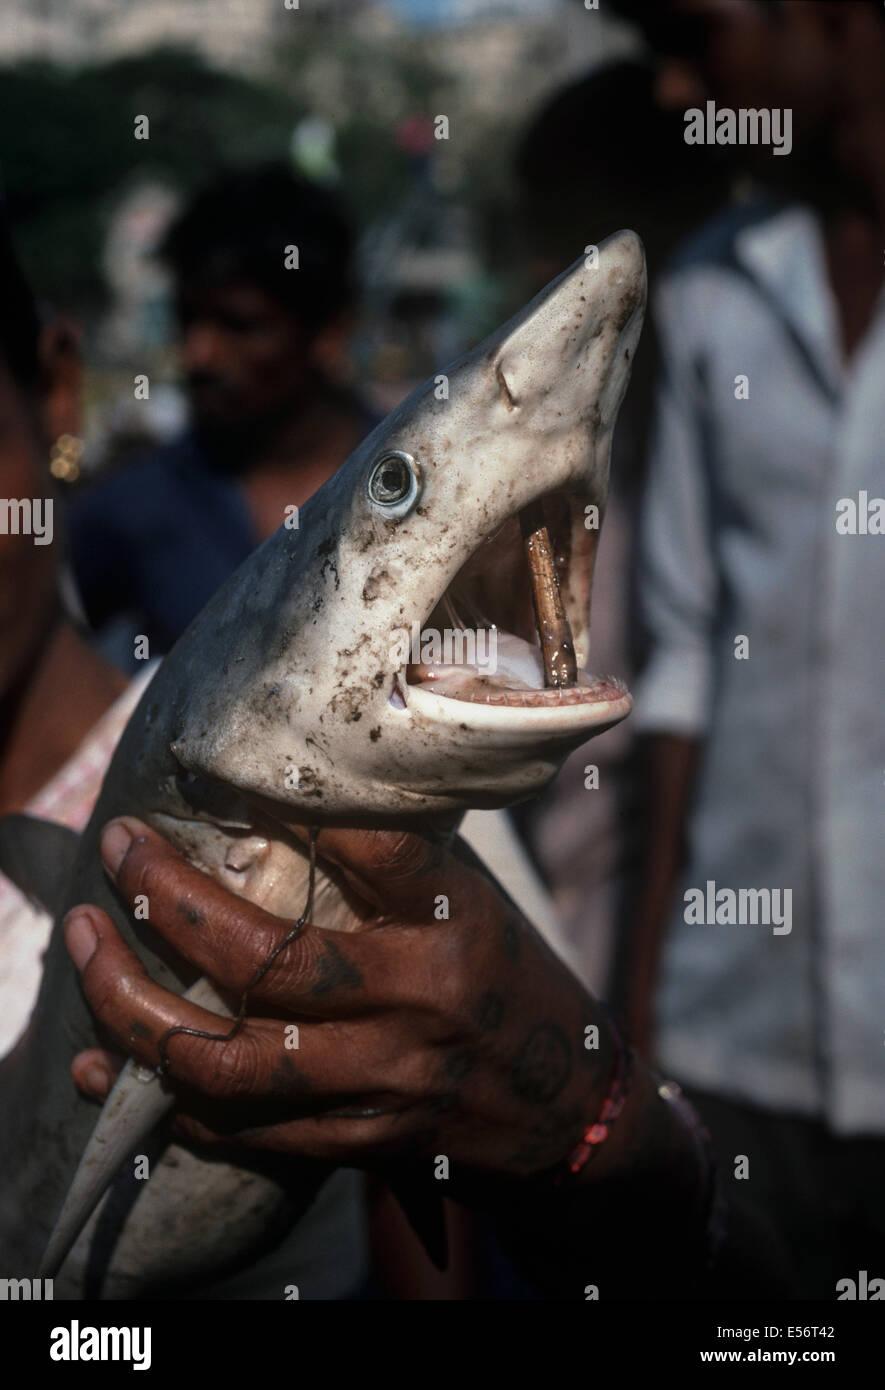 Reef shark (Carcharhinus perezi) being sold at the Bombay Fish Market. Bombay, India - Stock Image